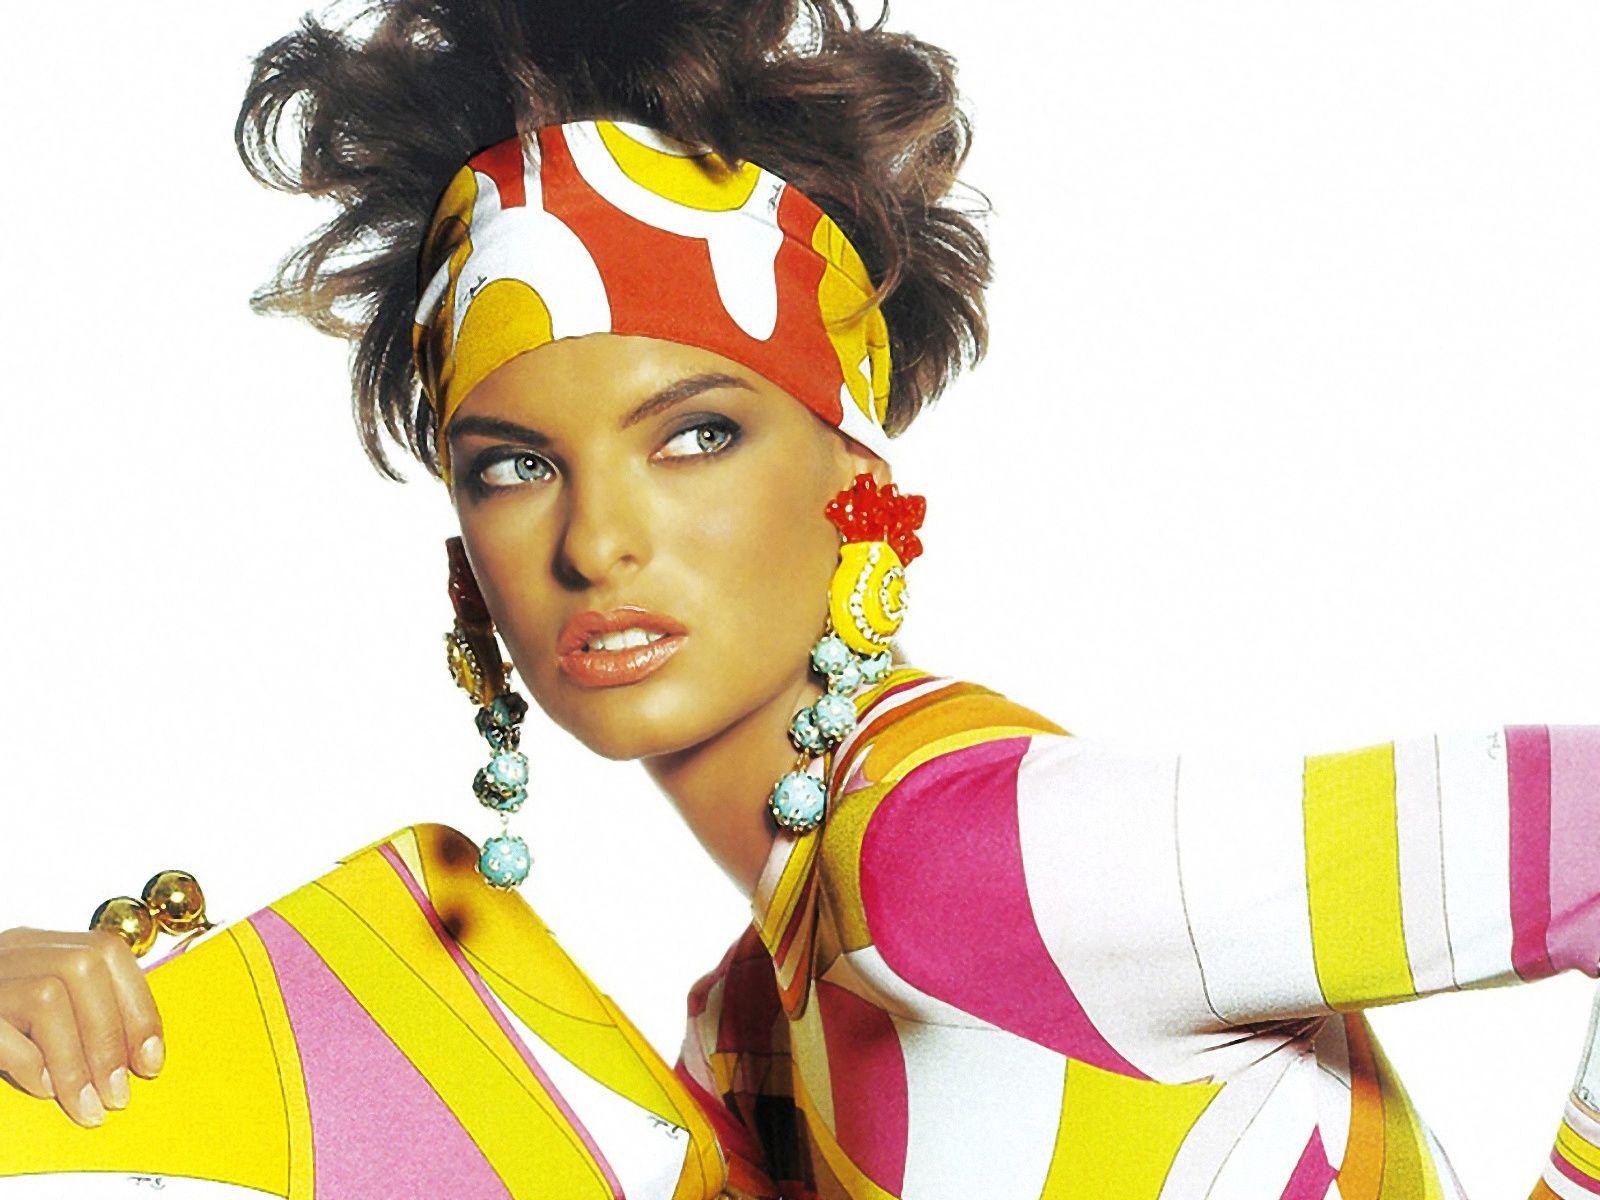 Linda-Evangelista-Images.jpg (1600×1200)